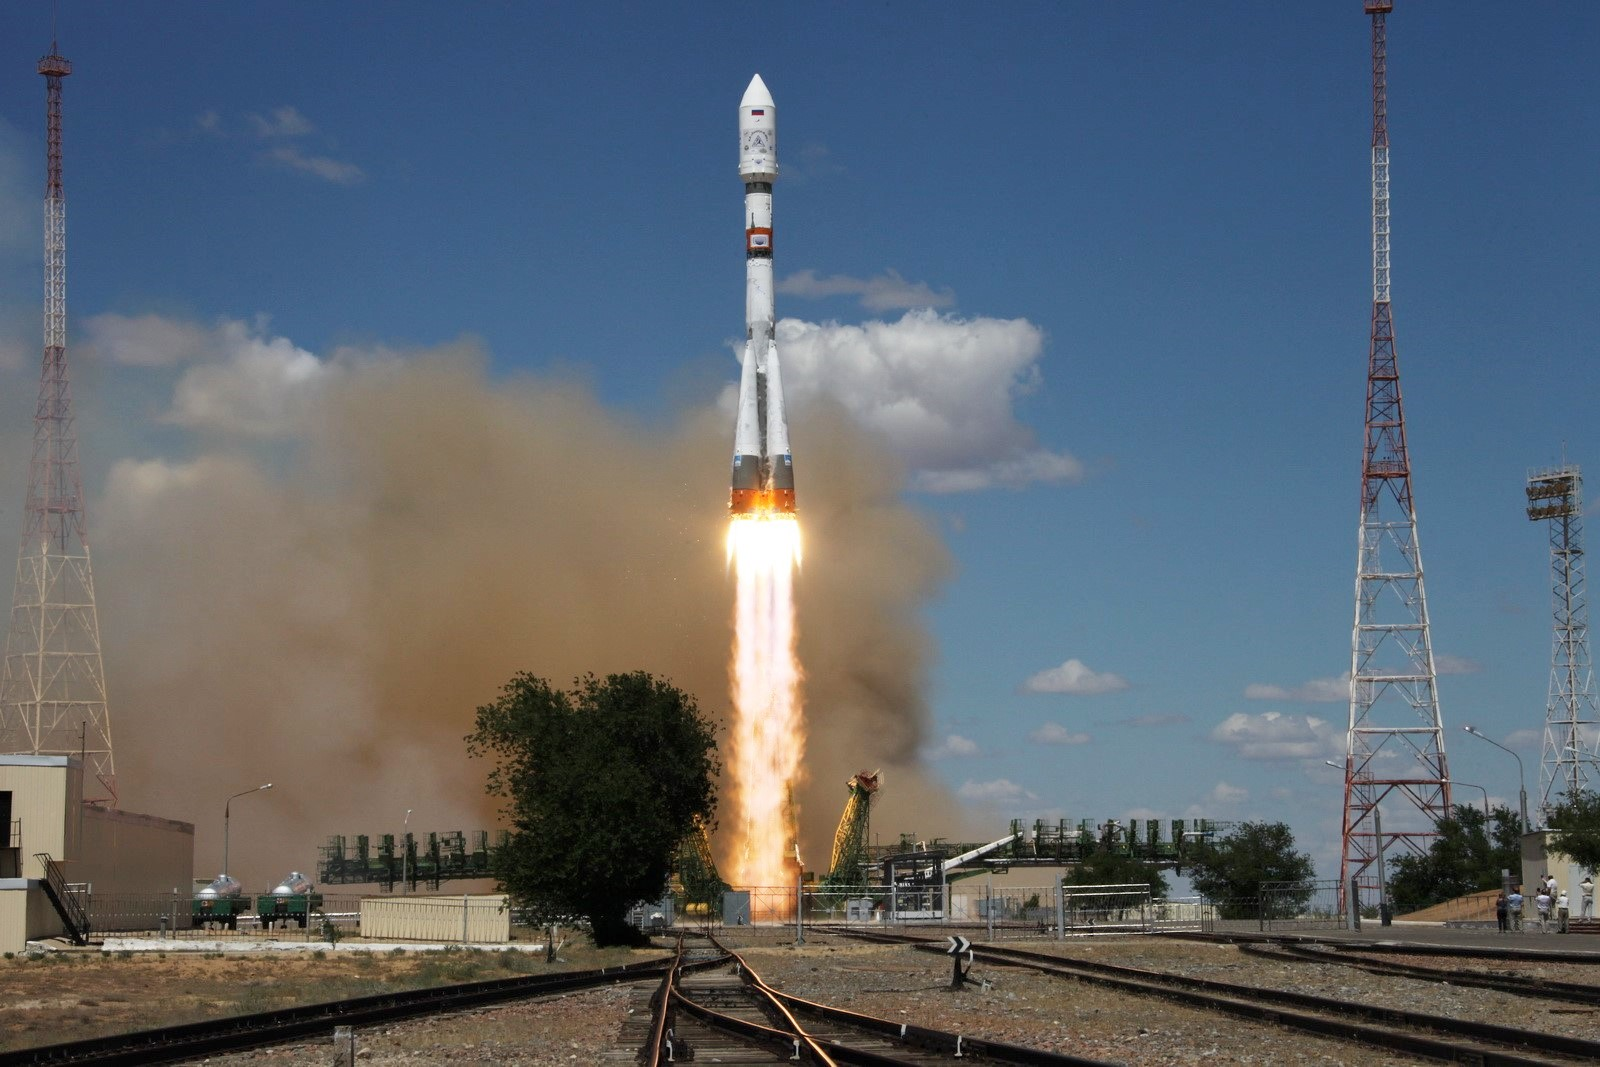 Soyuz-2.1a / Kanopus-V-IK launch